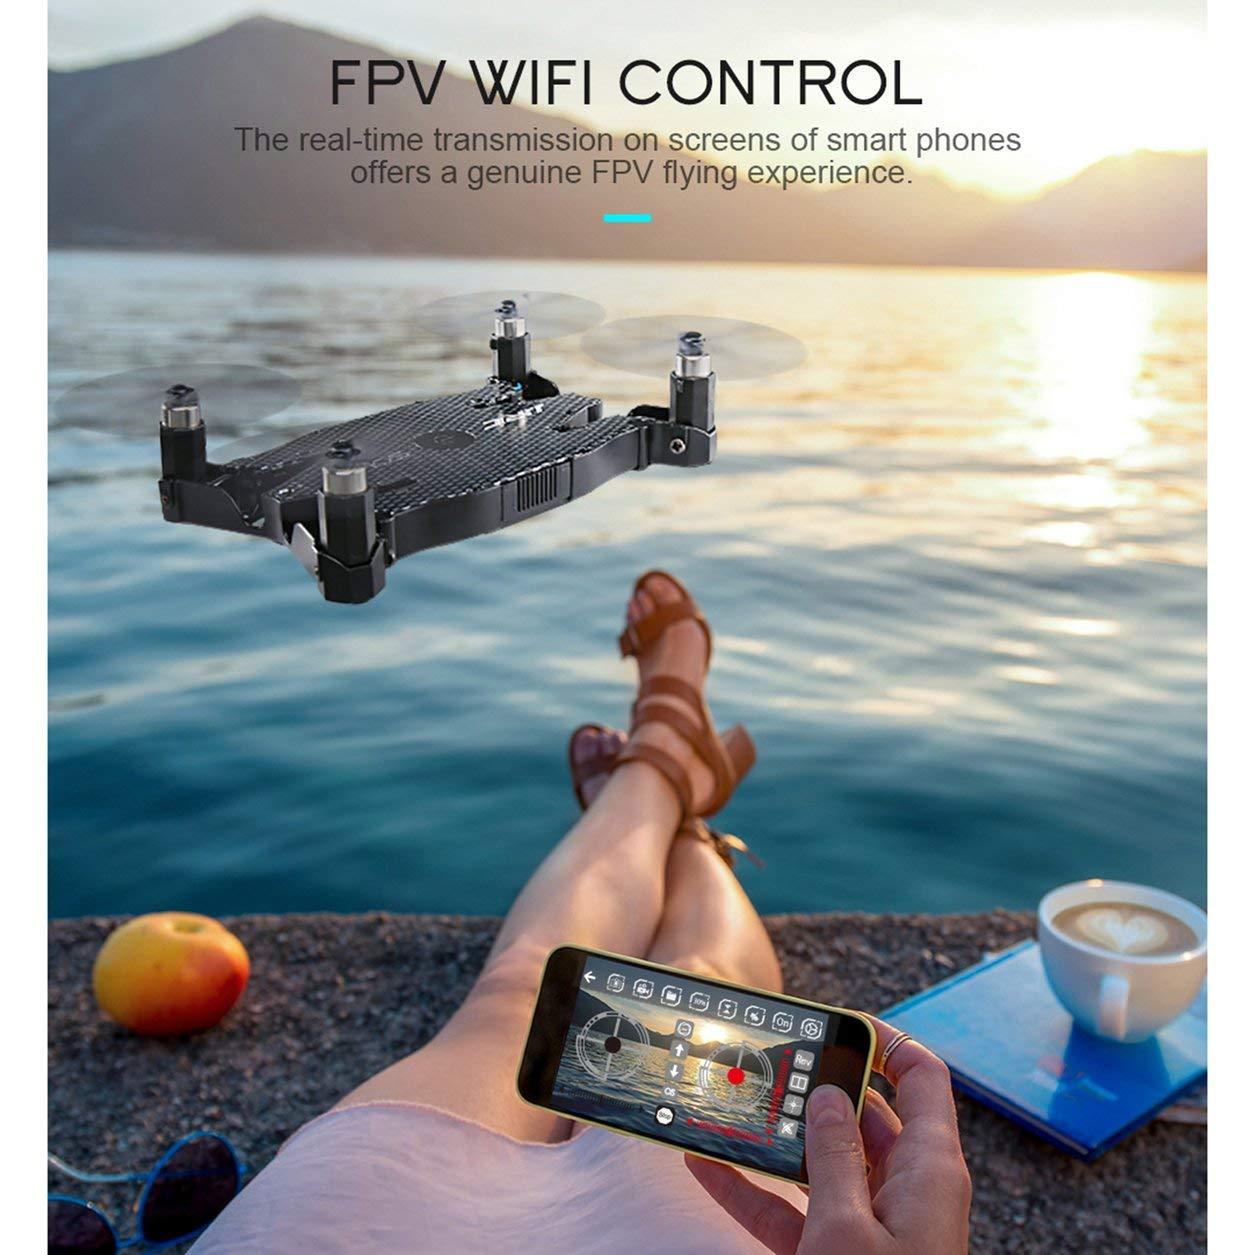 Dailyinshop JJR / C H49 WiFi FPV 720 P Kamera Ultradünne Faltbare Mini Höhe Halten Drohne (Farbe: Schwarz)